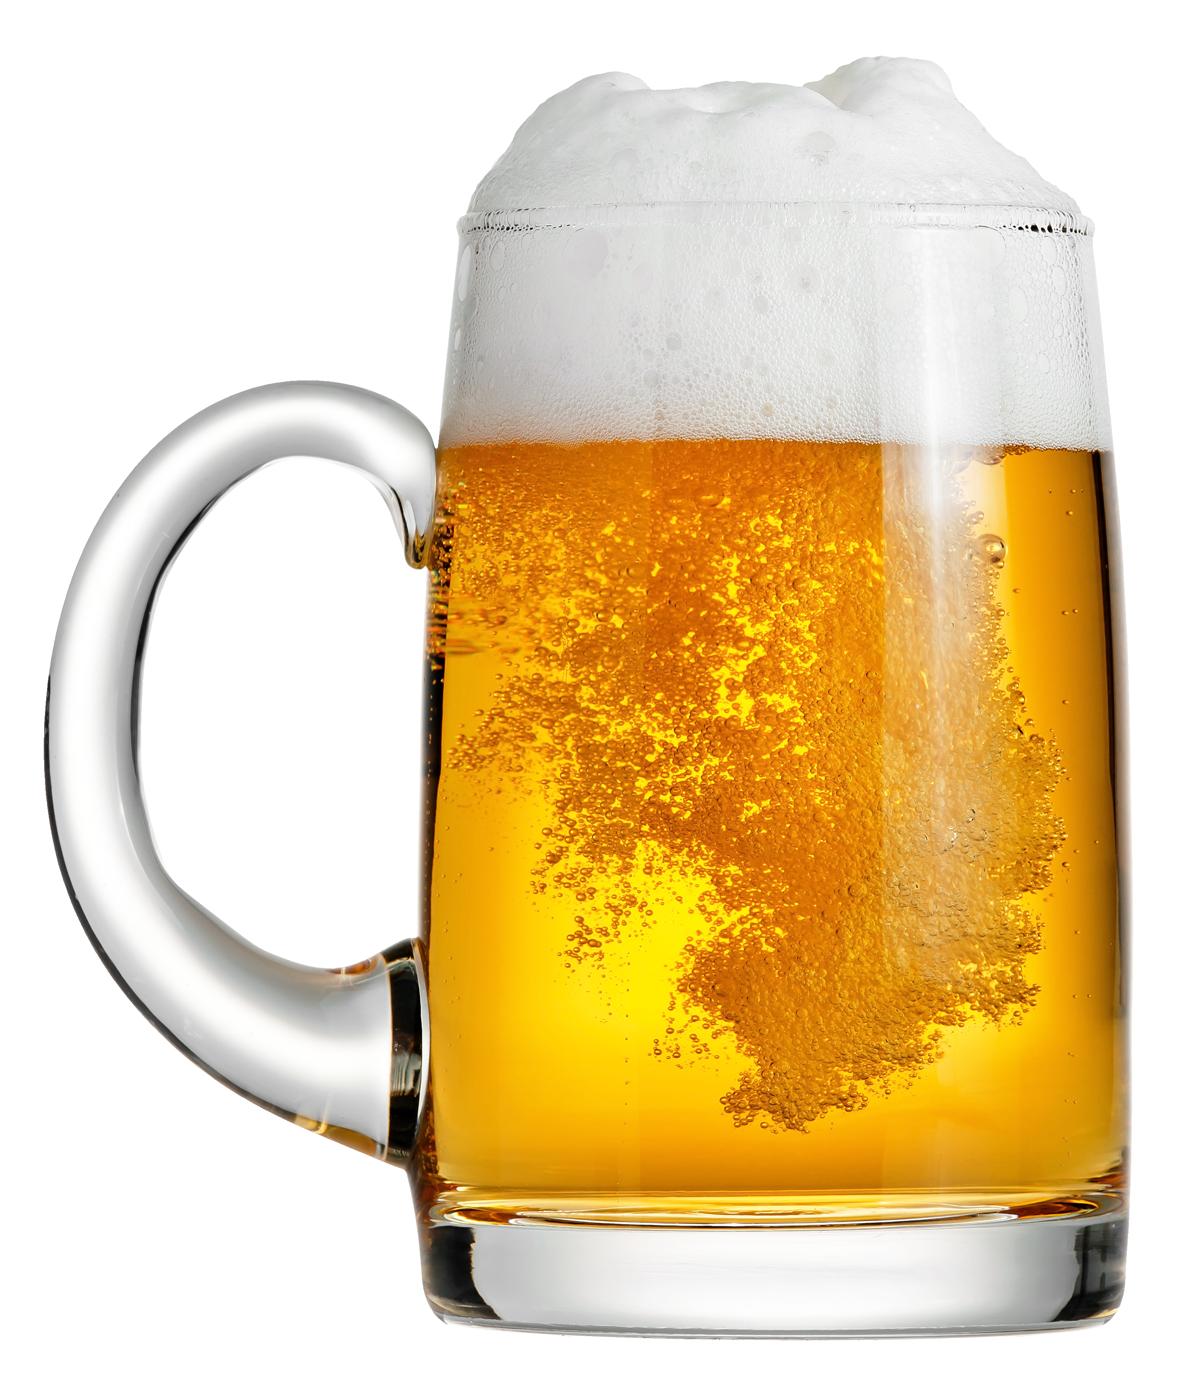 Beer Mug PNG Image